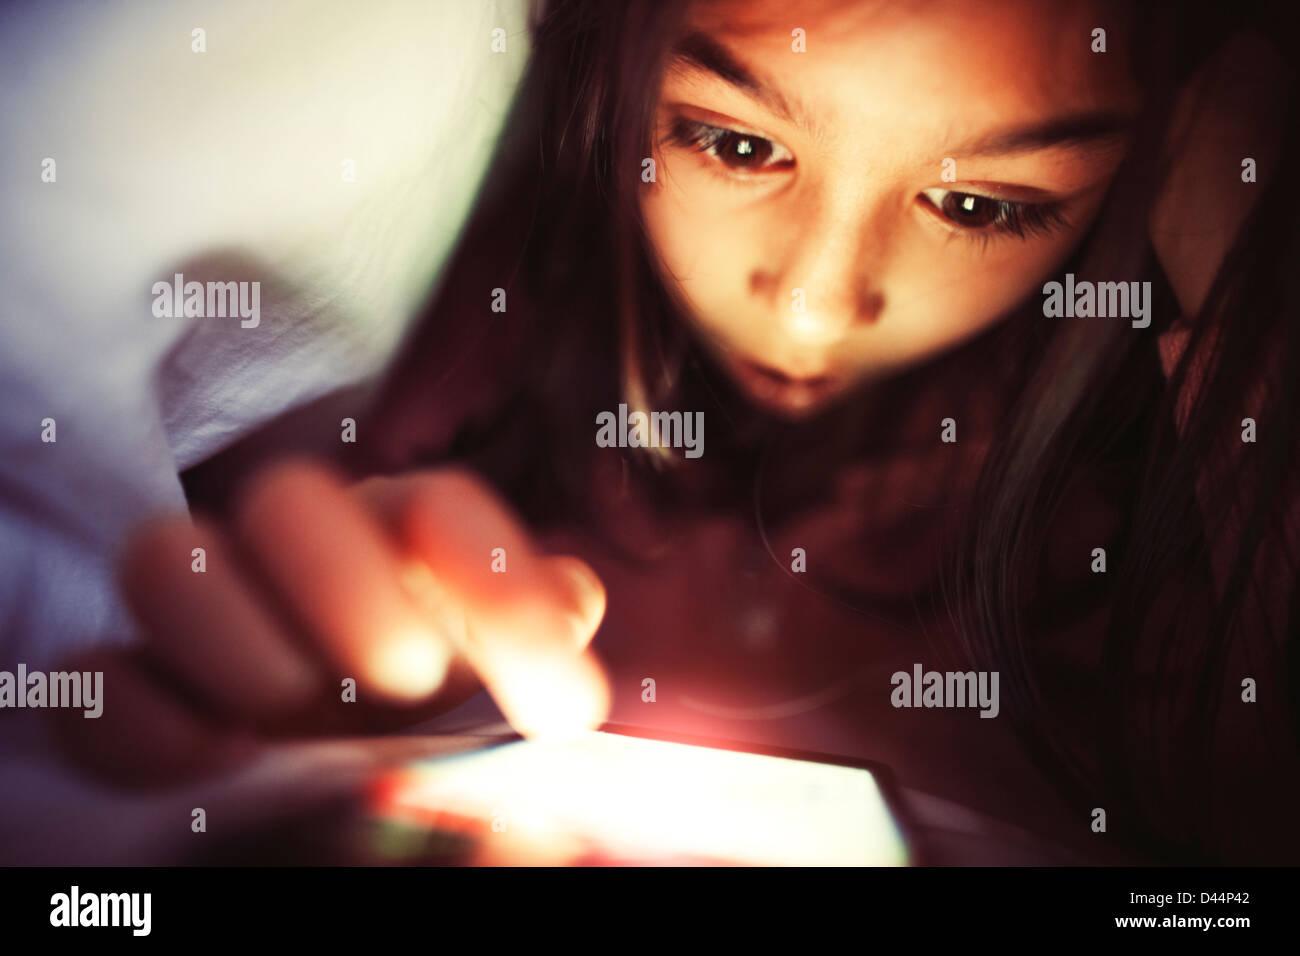 Girl utilise smartphone, sous les couvre-lits Photo Stock